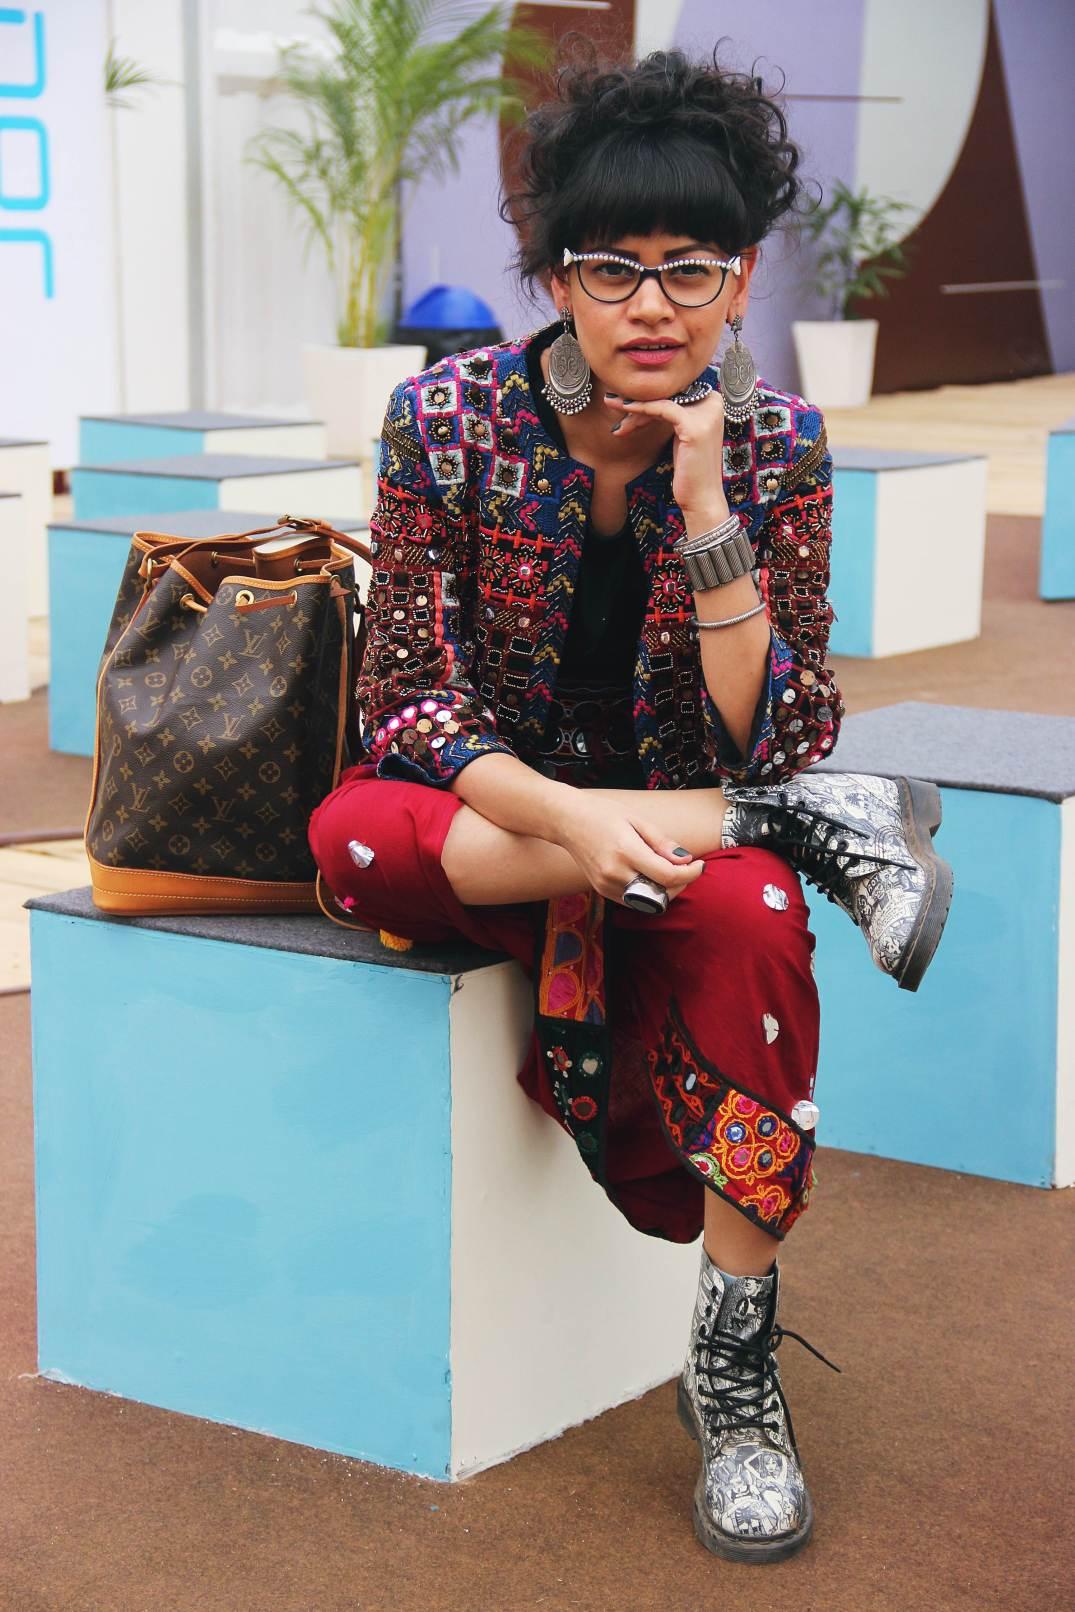 street style aifw-aw17-new delhi-india-fashion-style (6)